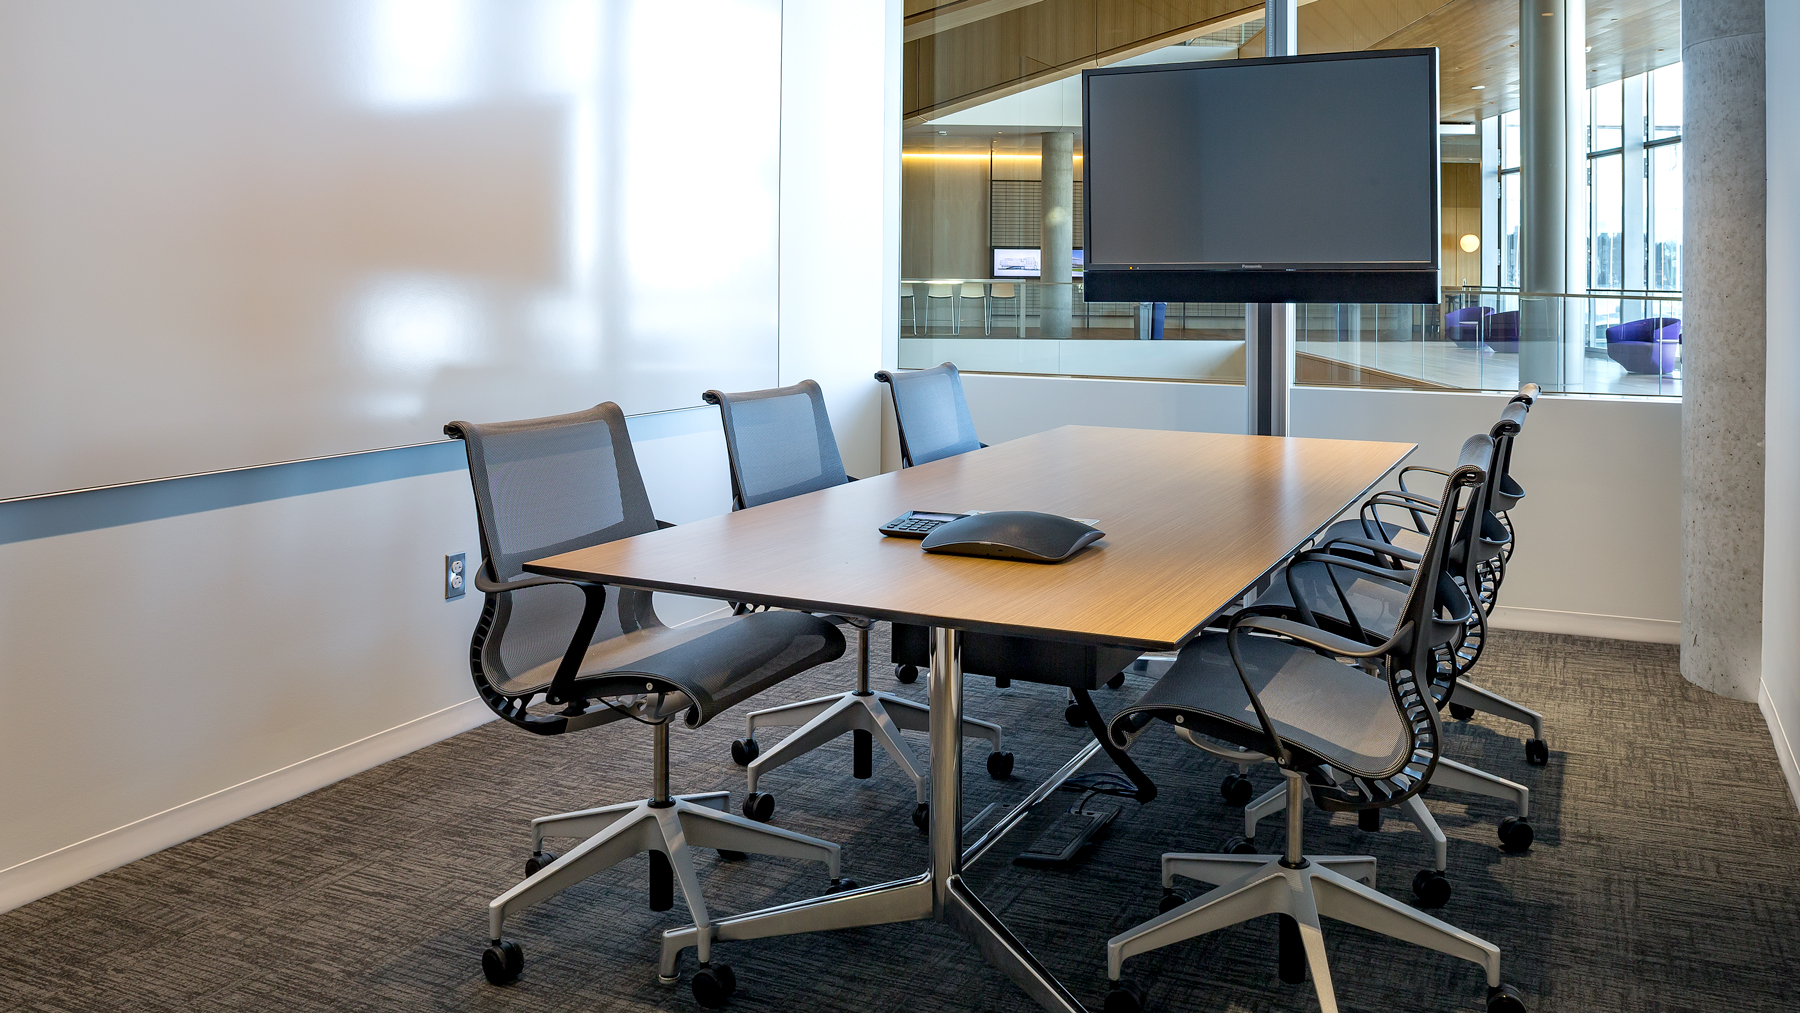 Room 1119 Group Study Room